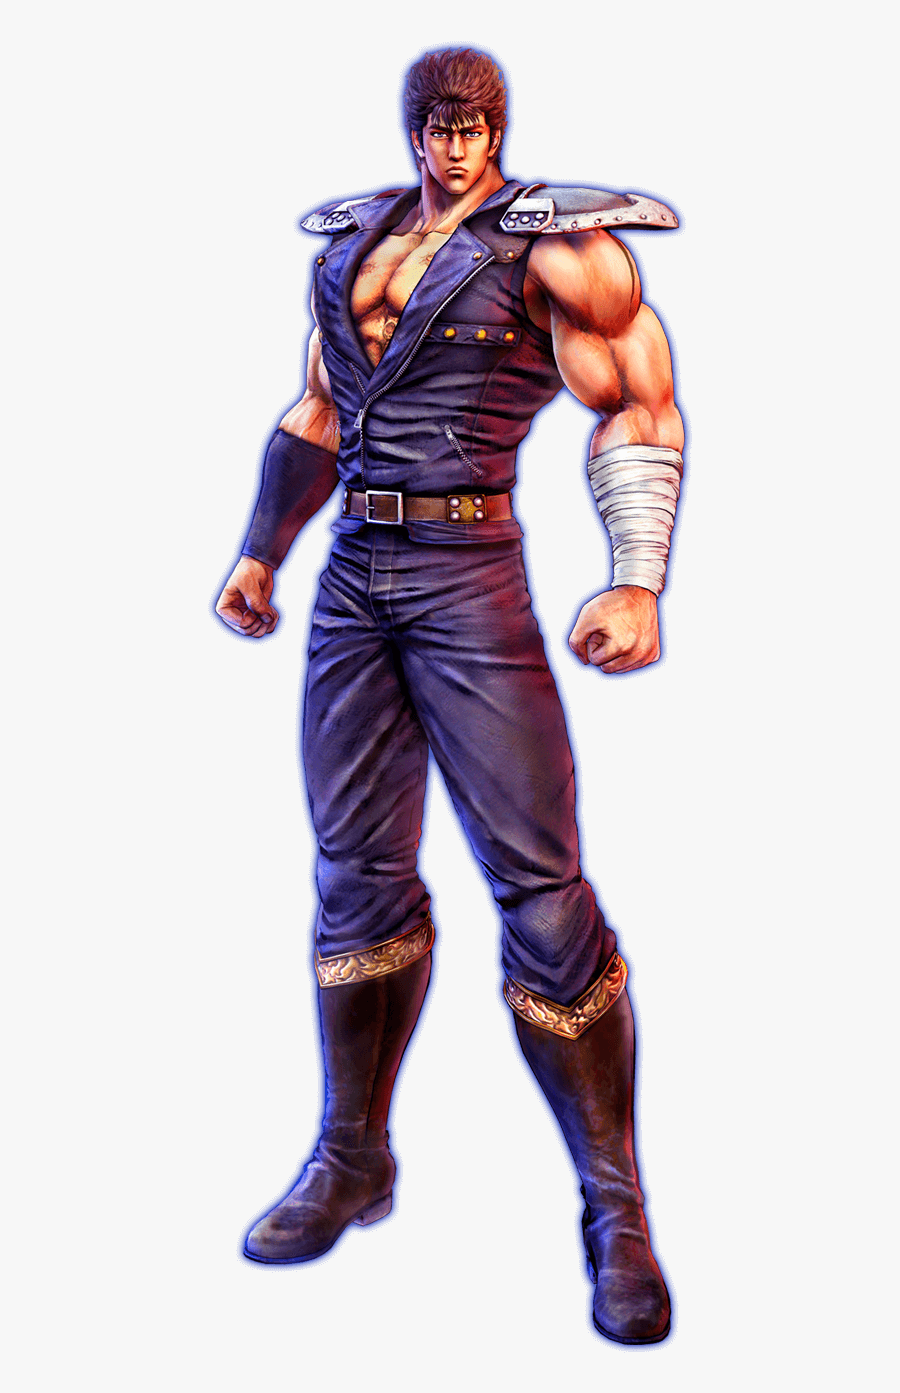 Fist Of The North Star - Fist Of The North Star Main Character, Transparent Clipart